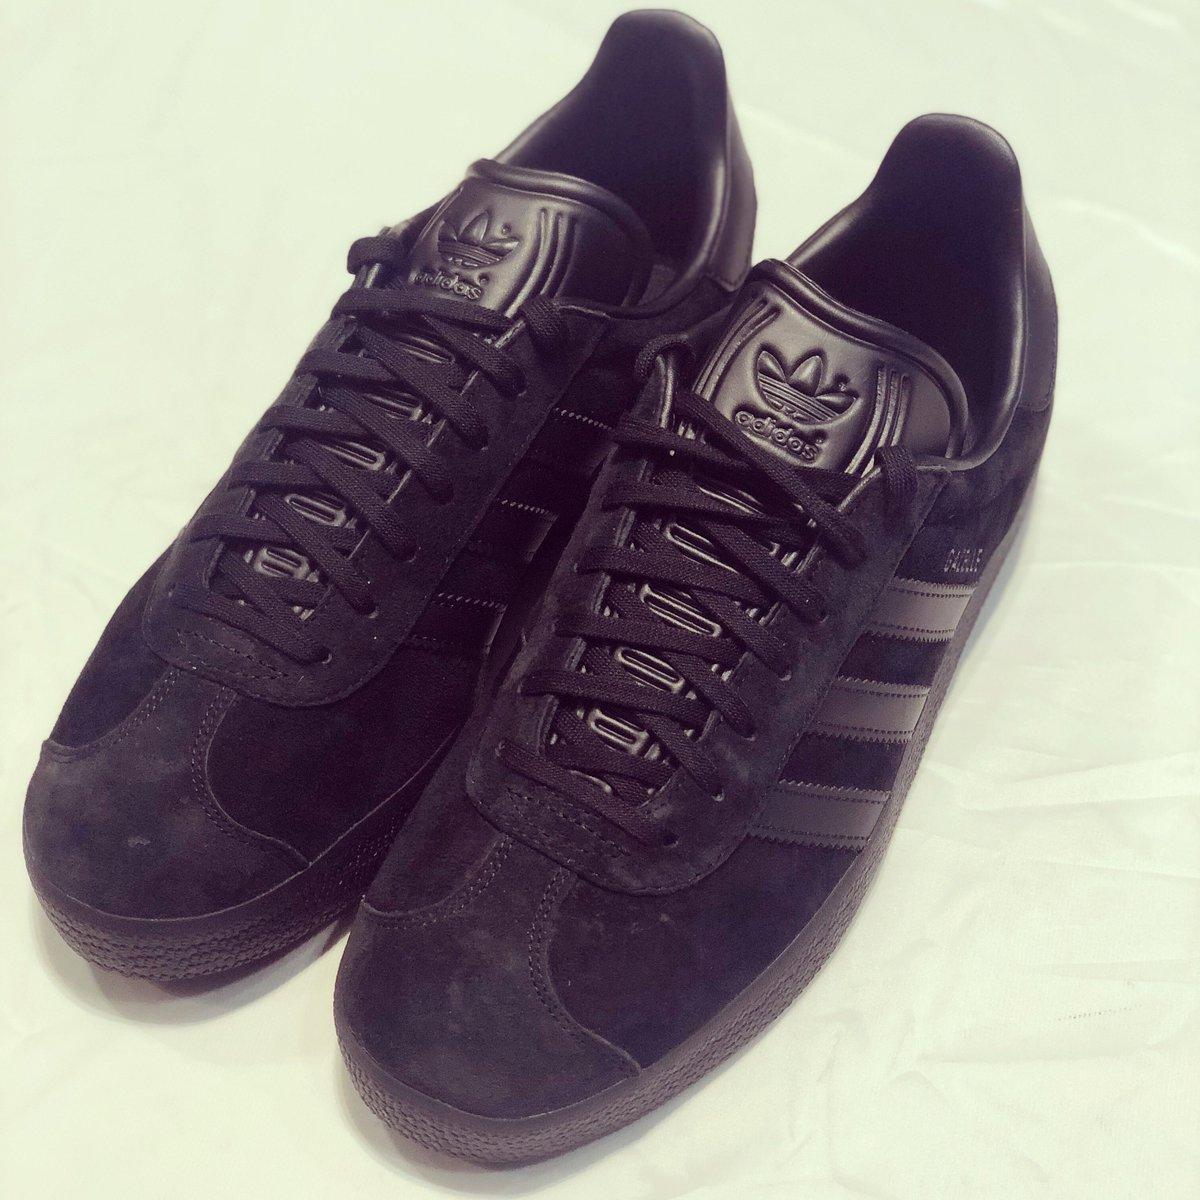 blackout adidas Gazelle crafted